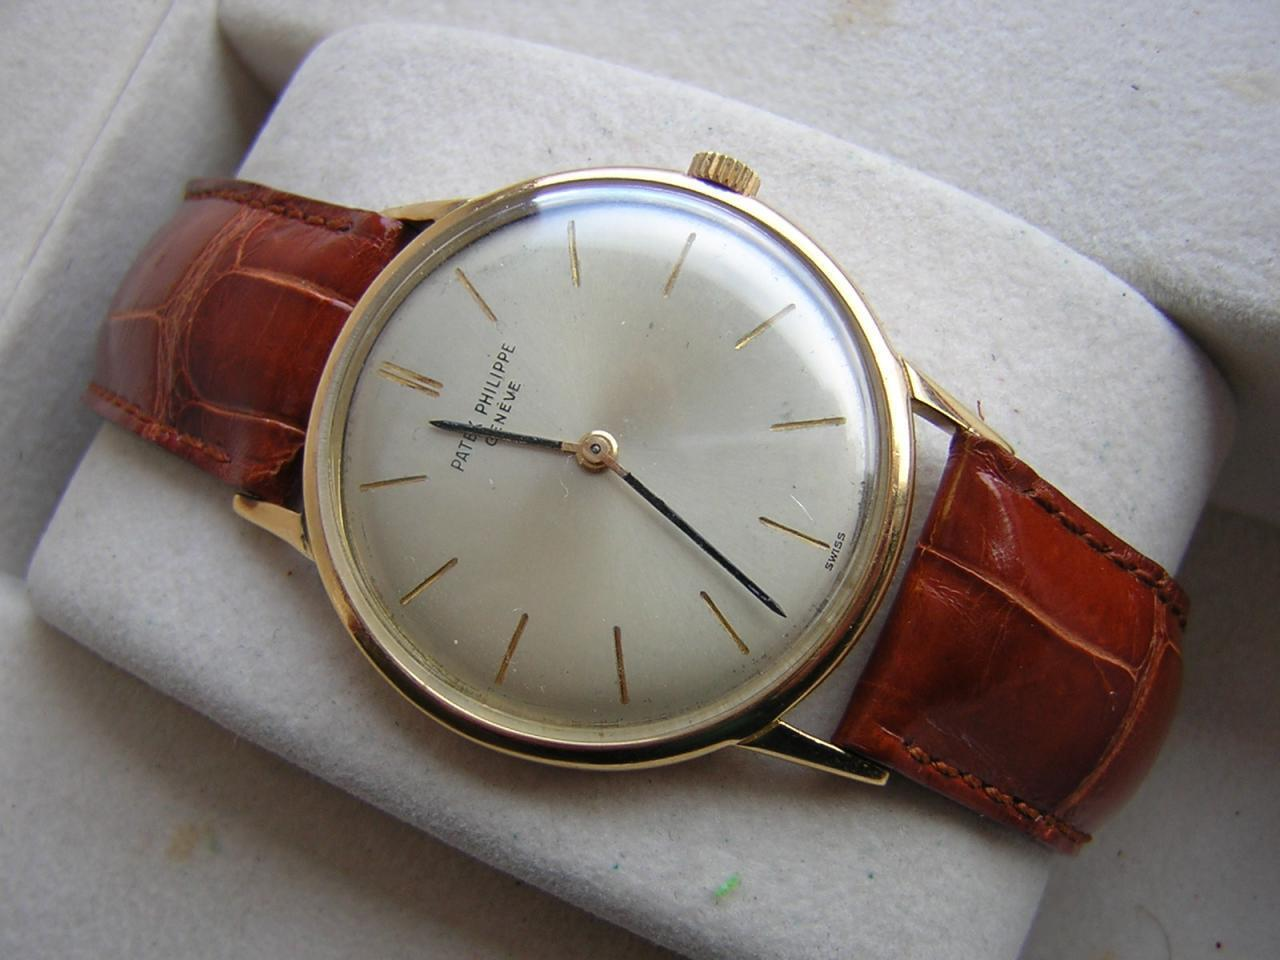 PATEK PHILIPPE MEN'S WATCH AGE: 1960's WRISTWATCH - watch picture 1